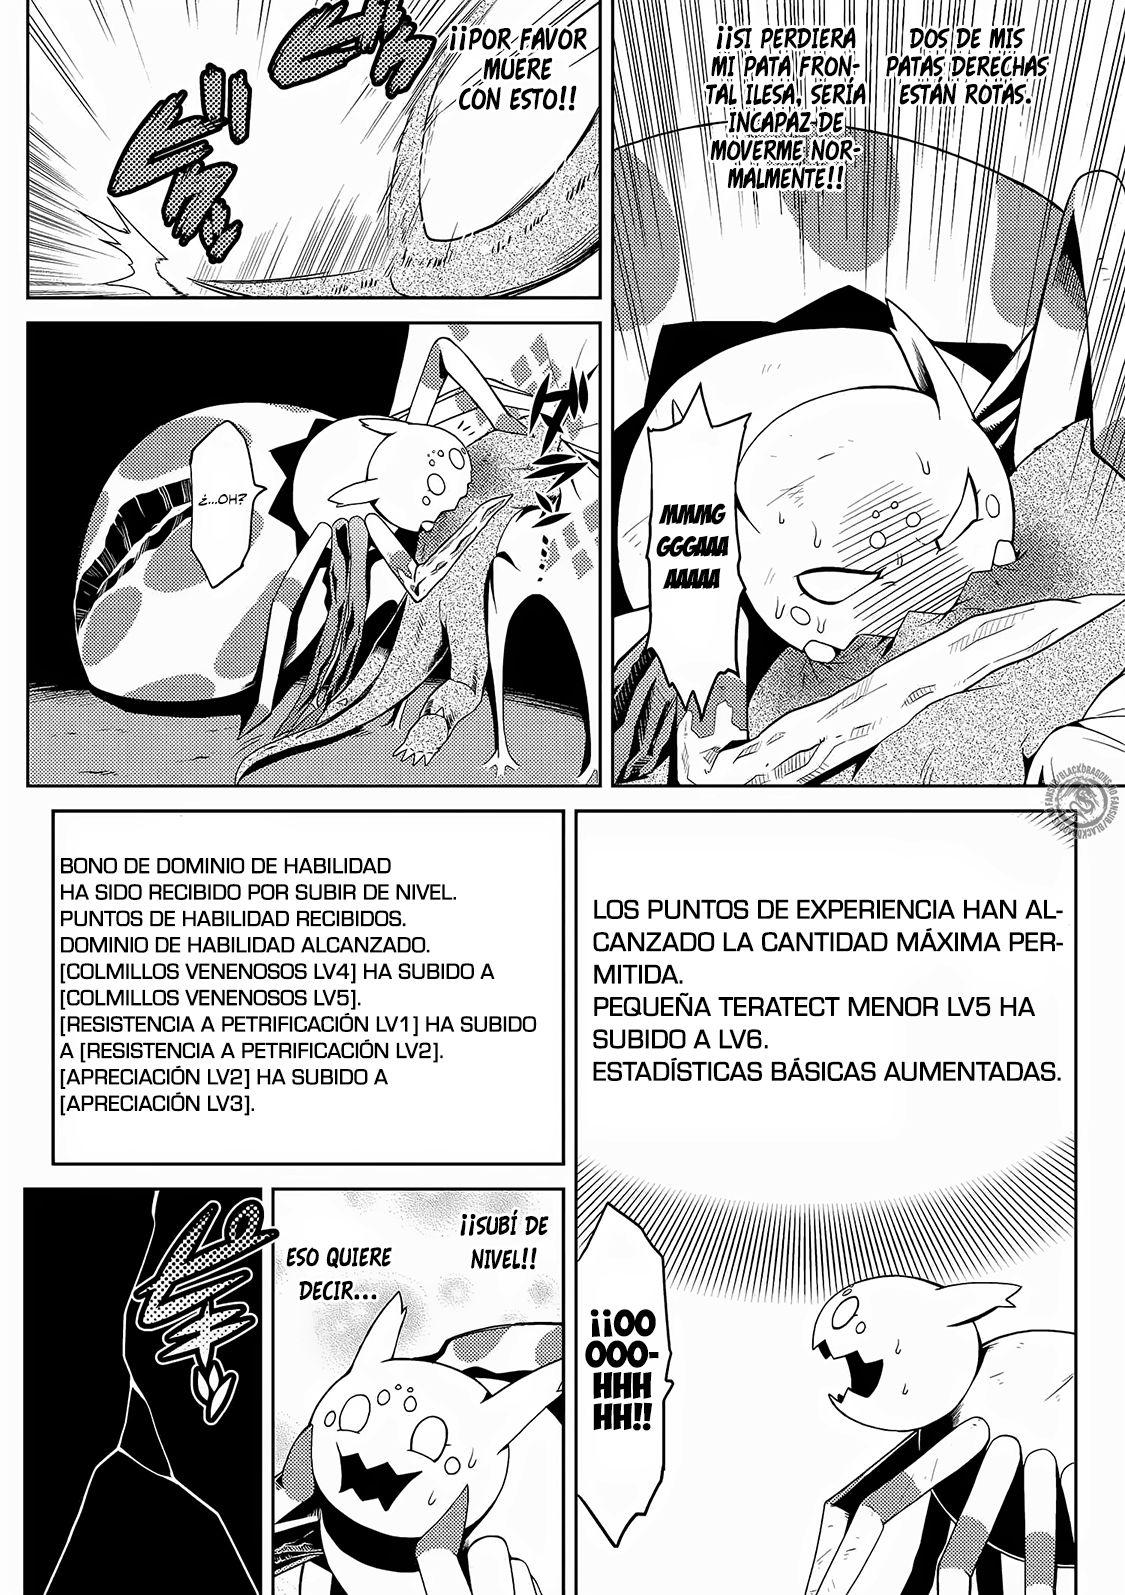 http://c5.ninemanga.com/es_manga/59/18683/466138/85ea282c45a69b03b4c8a63fb0bb5259.jpg Page 7